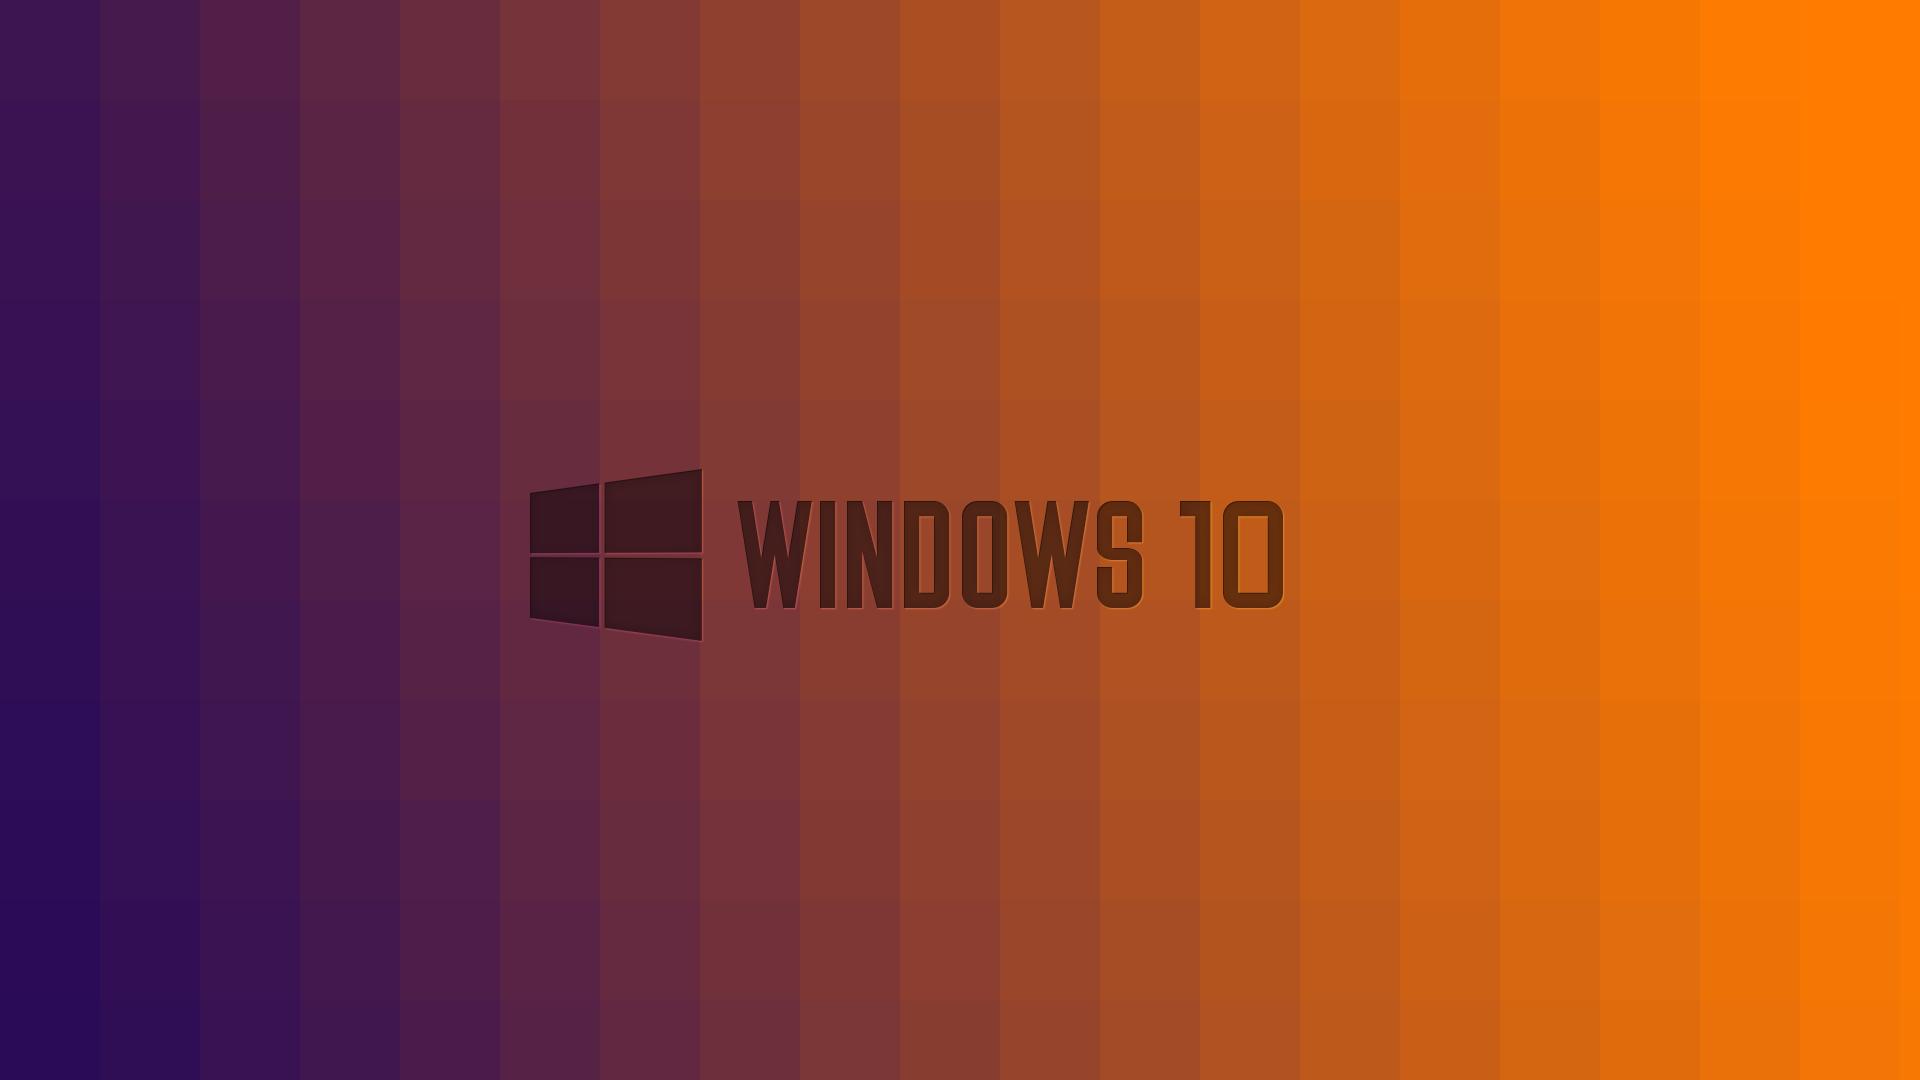 Windows 10 wallpaper by CryDagon